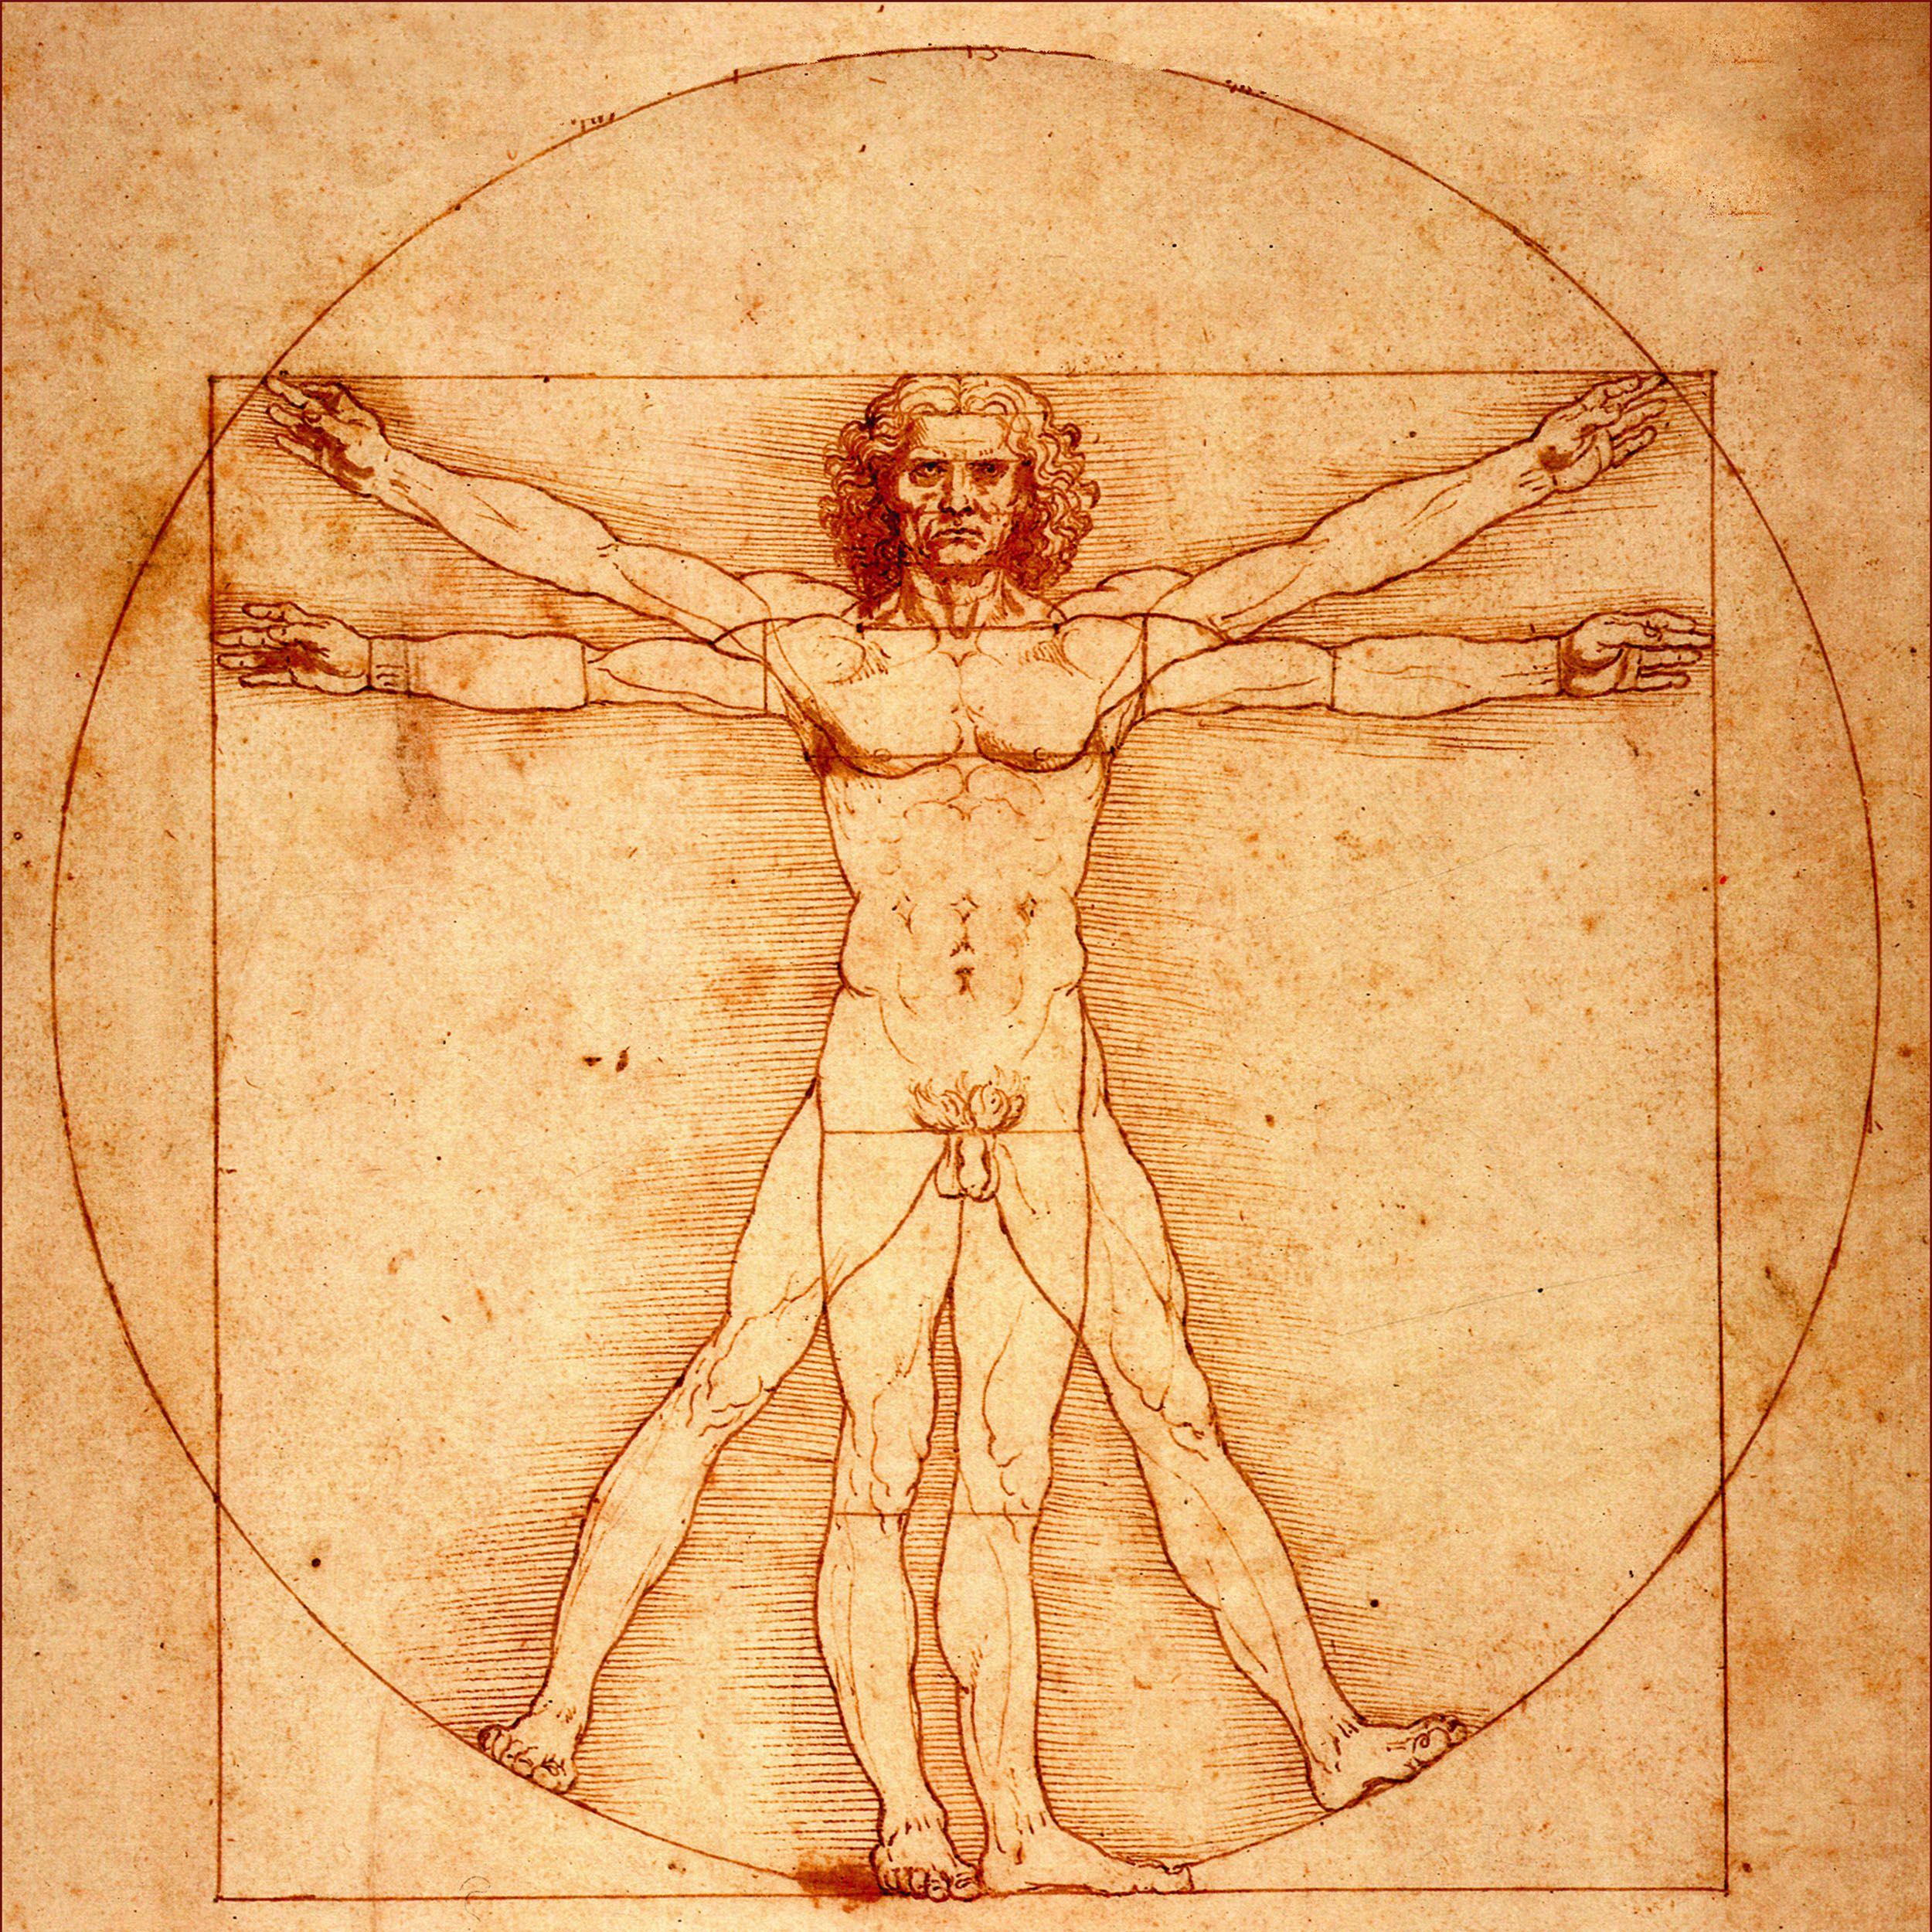 El Hombre de Vitruvio (de Leonardo da Vinci) | paintings | Pinterest